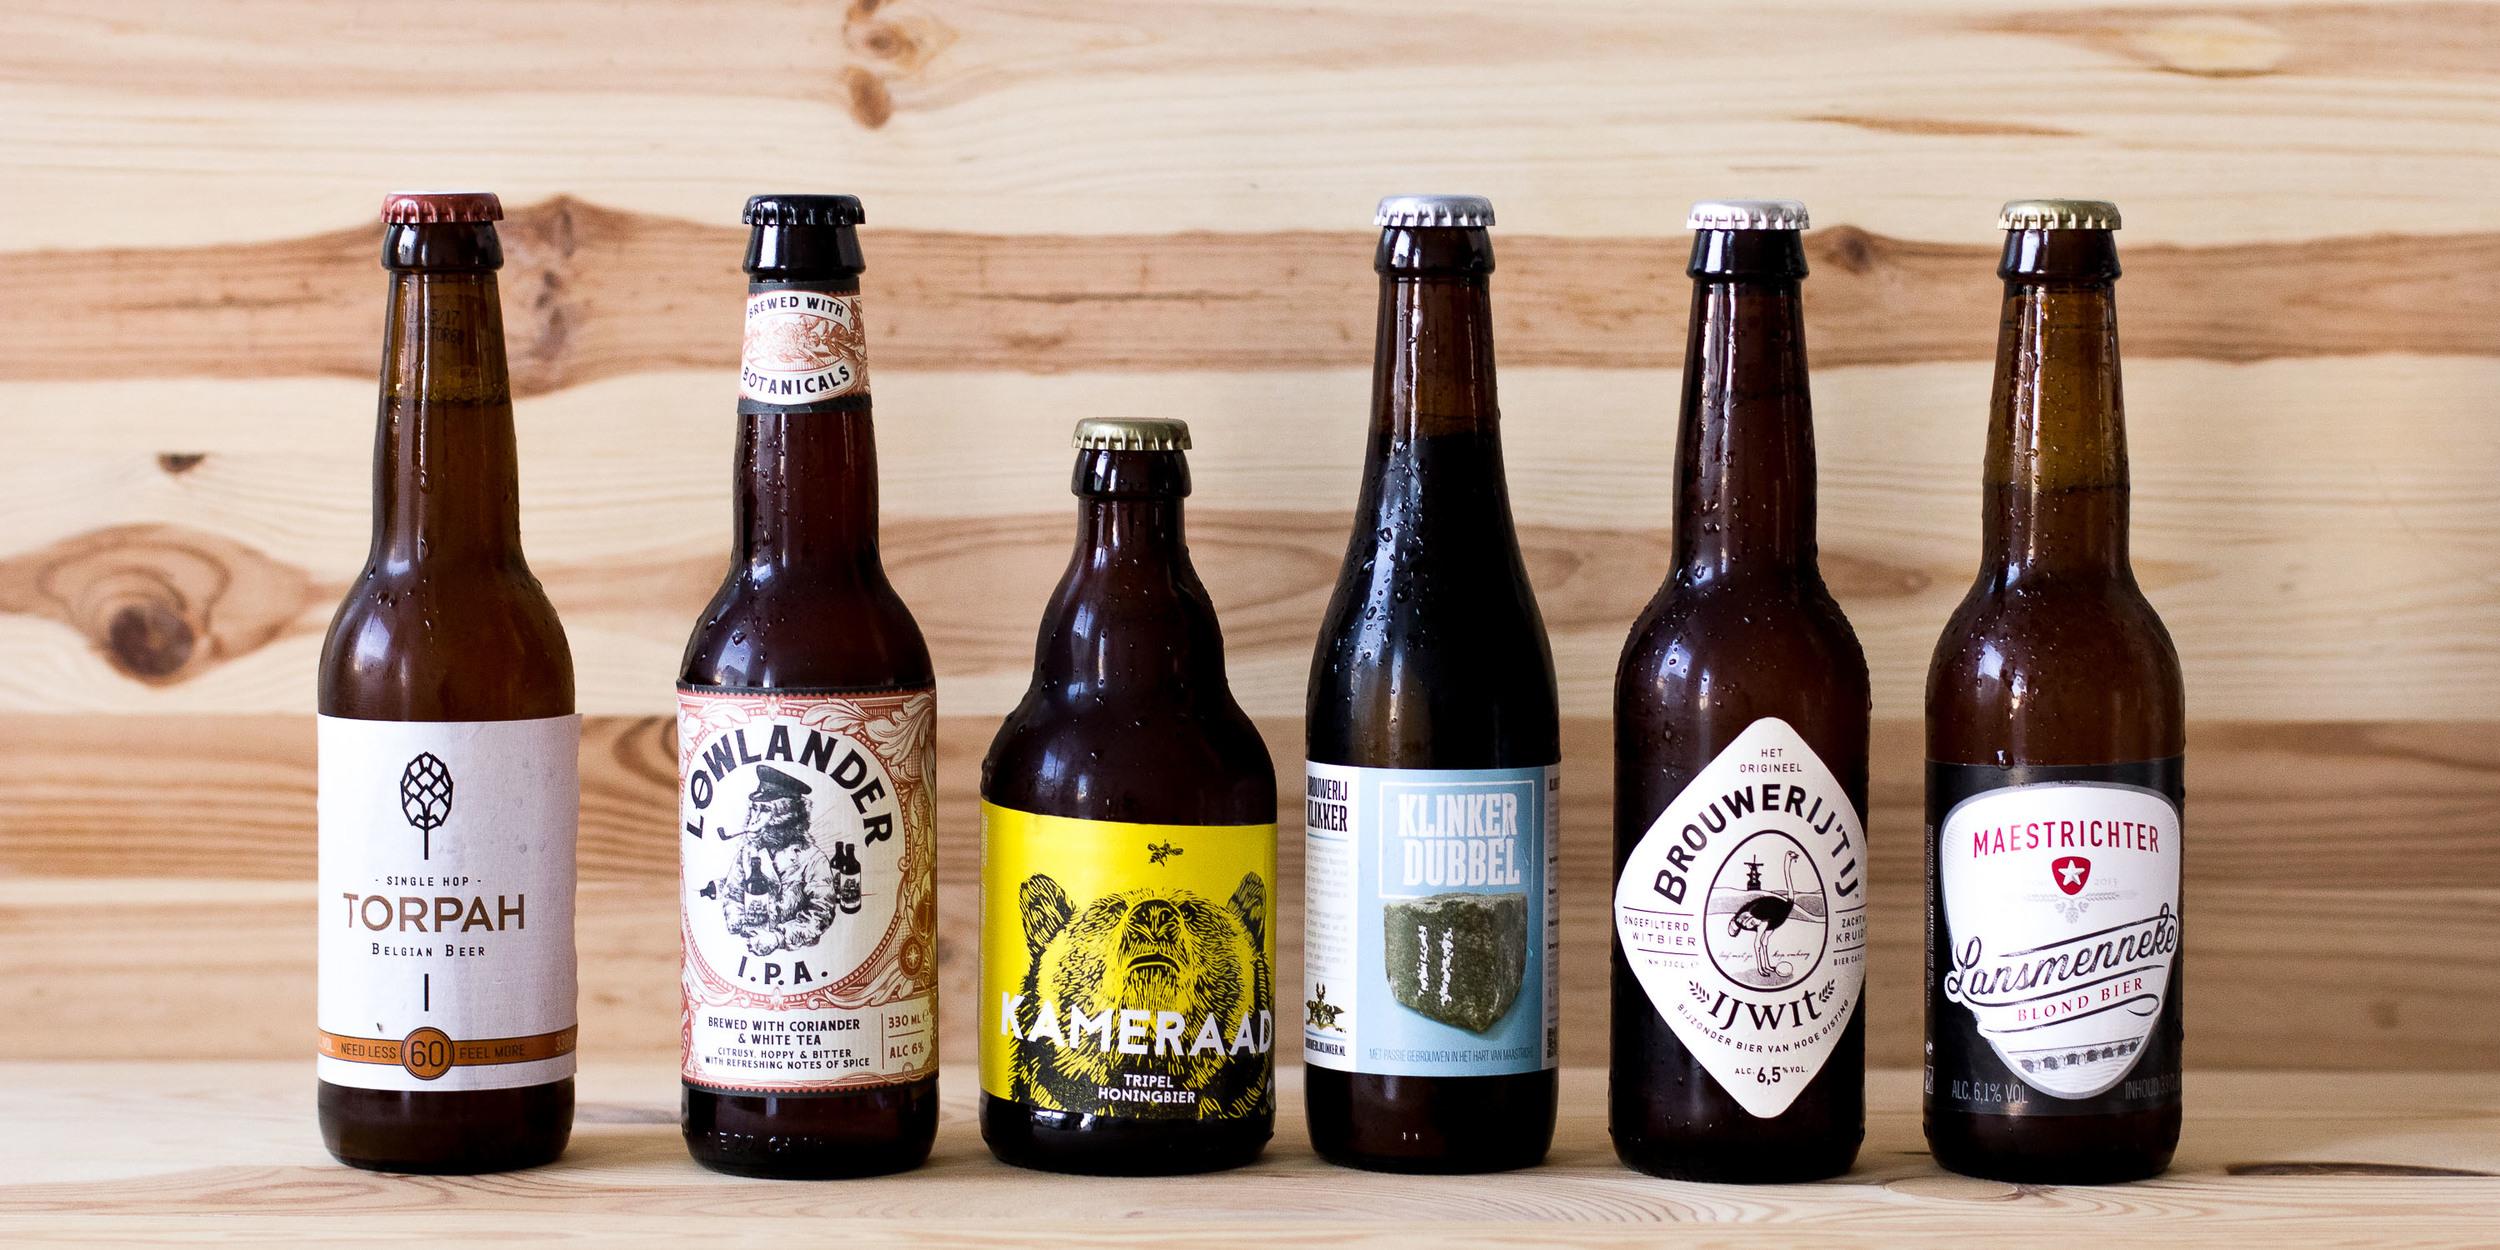 Cervezas Maastricht